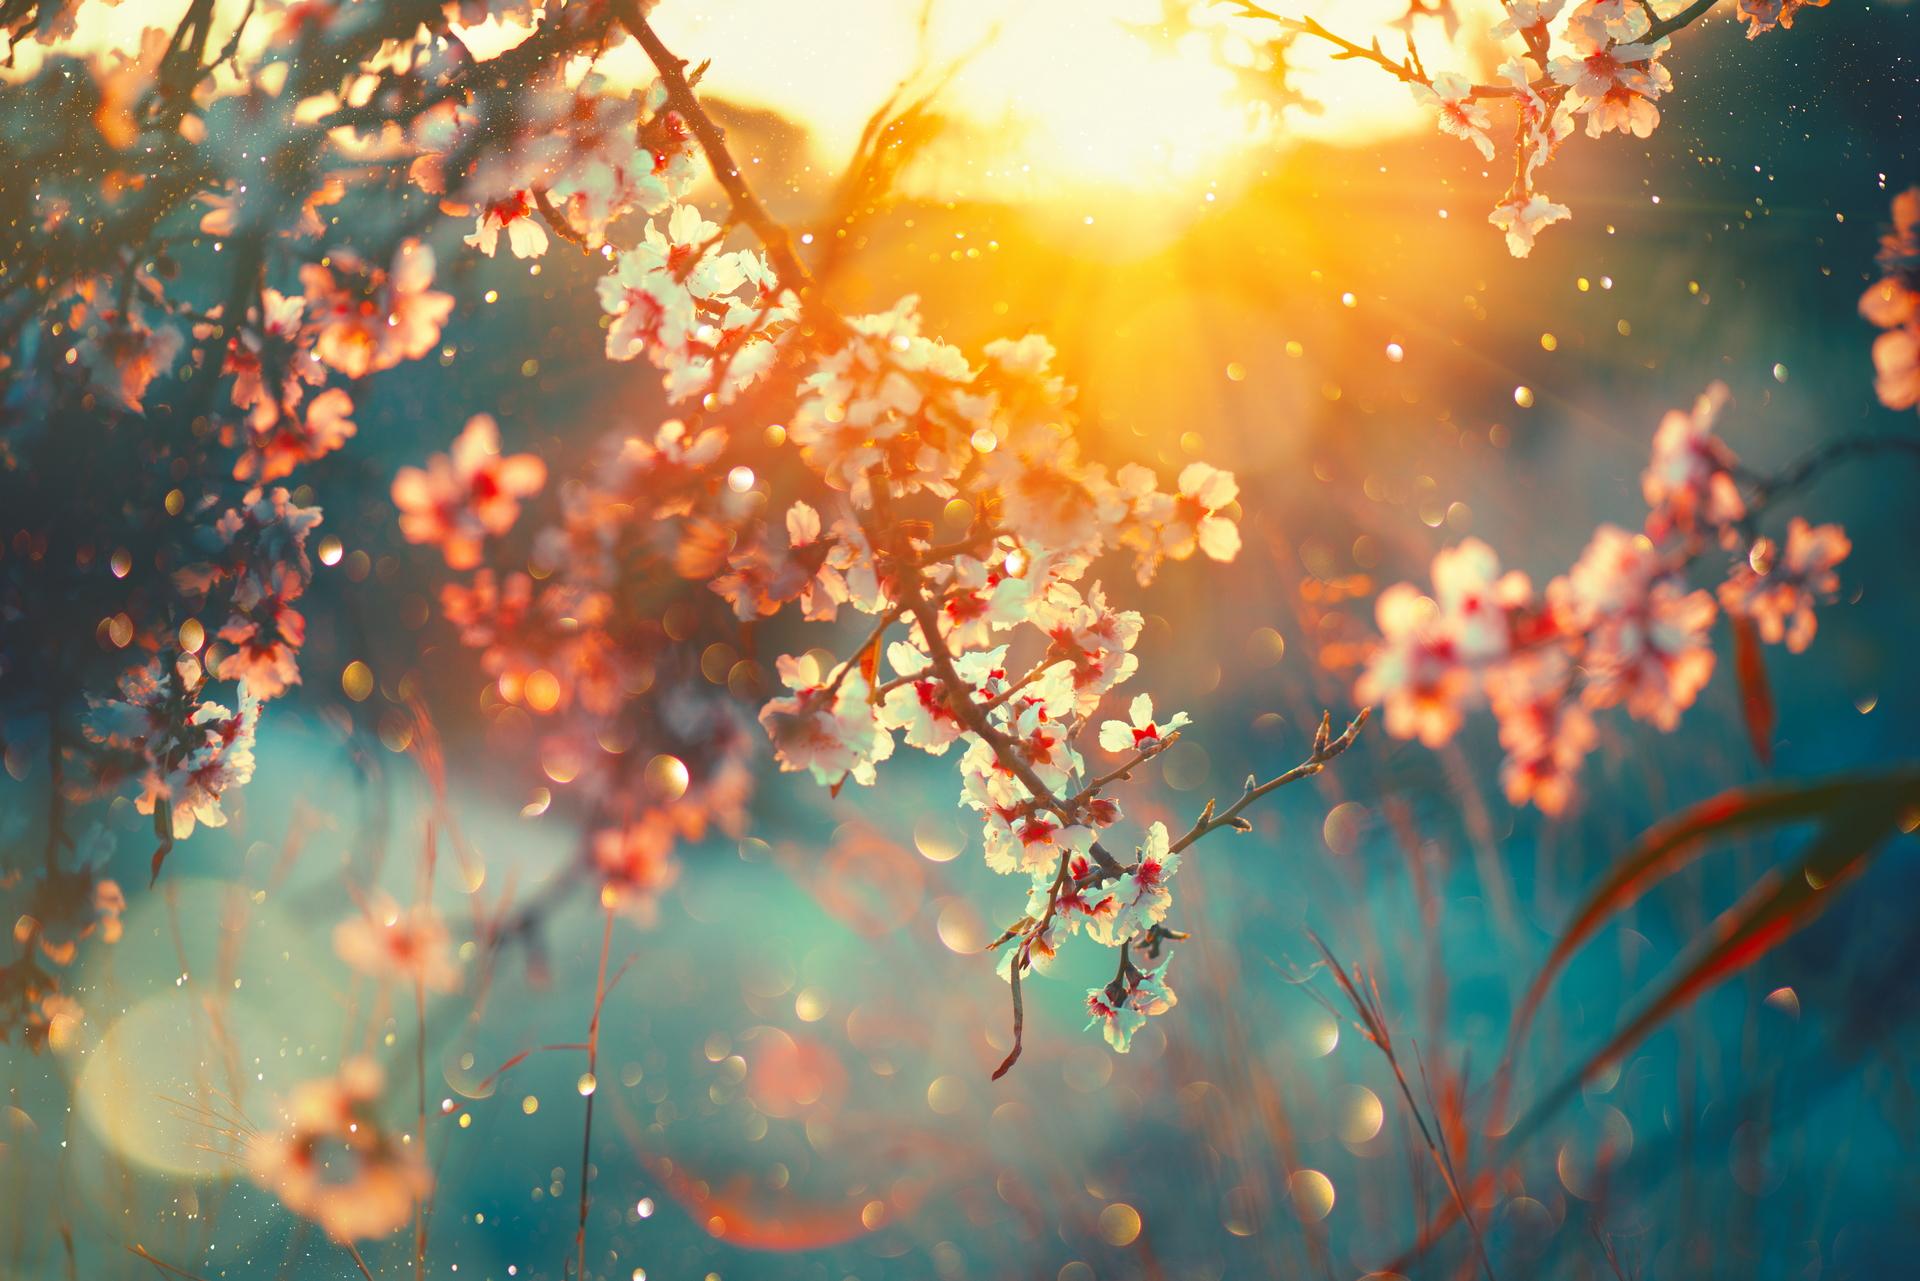 Earth Blossom 1920x1281